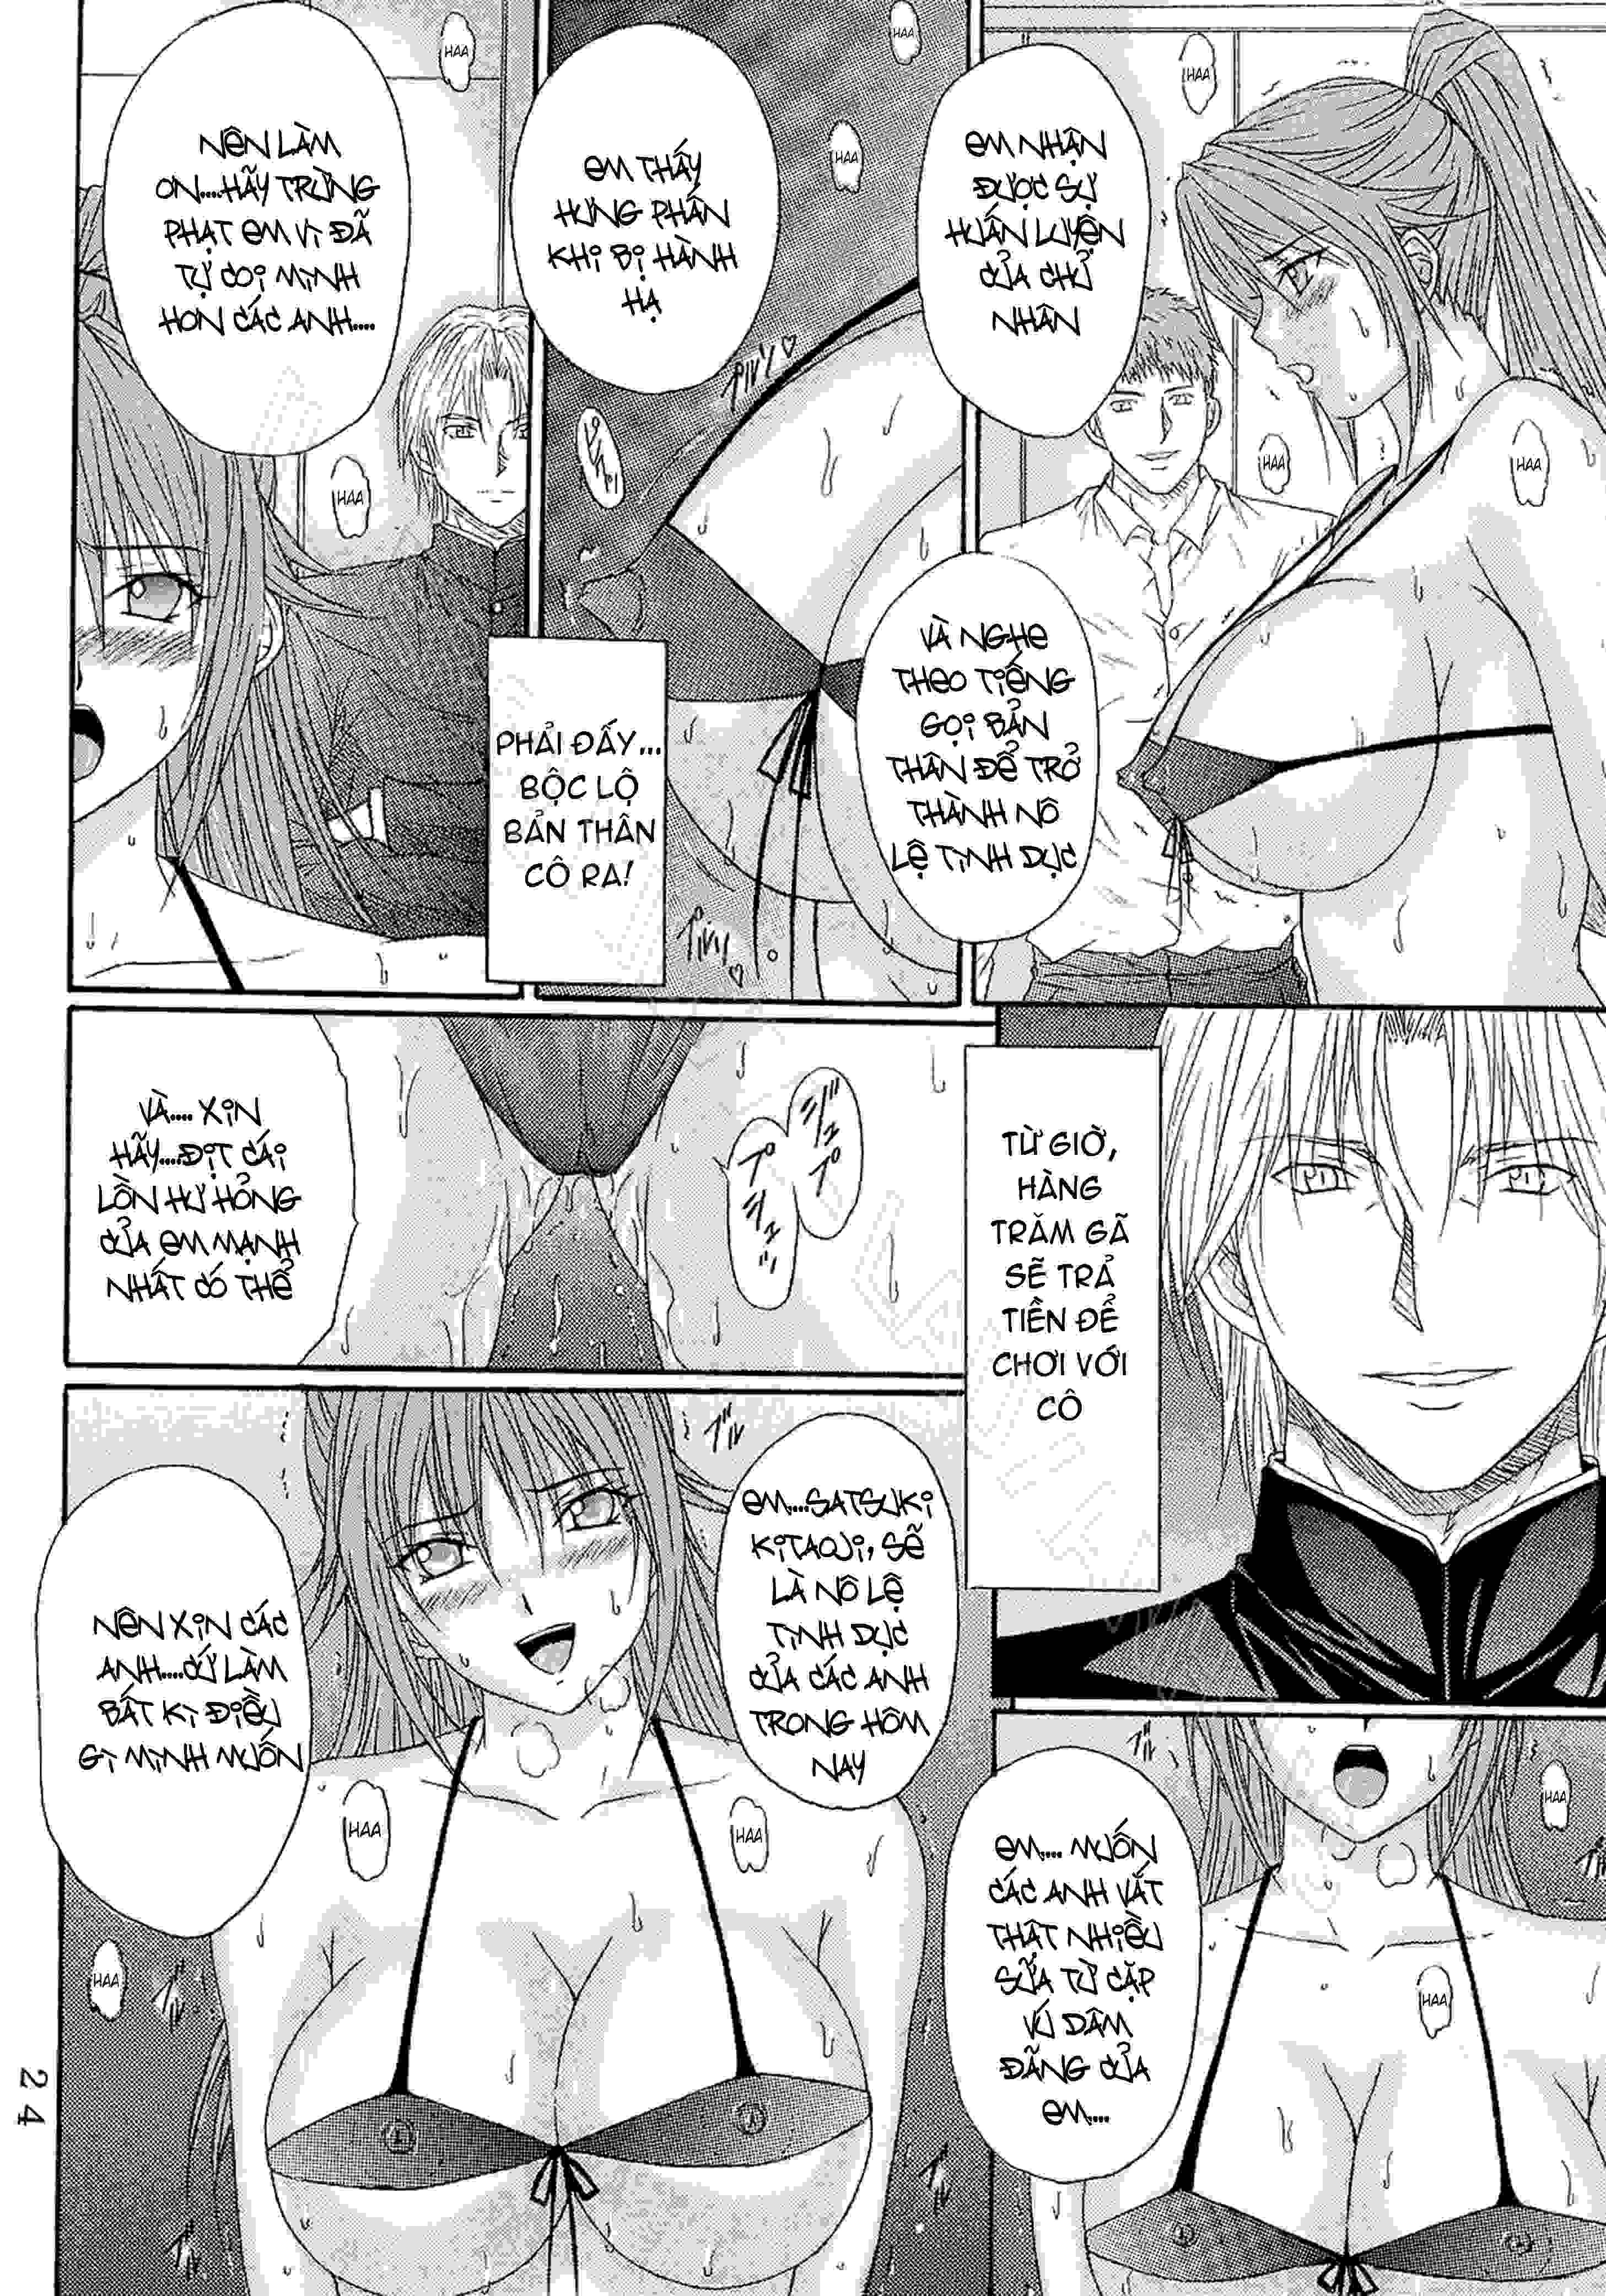 TruyenHay.Com - Ảnh 23 - Ryoujoku Rensa Chapter 6